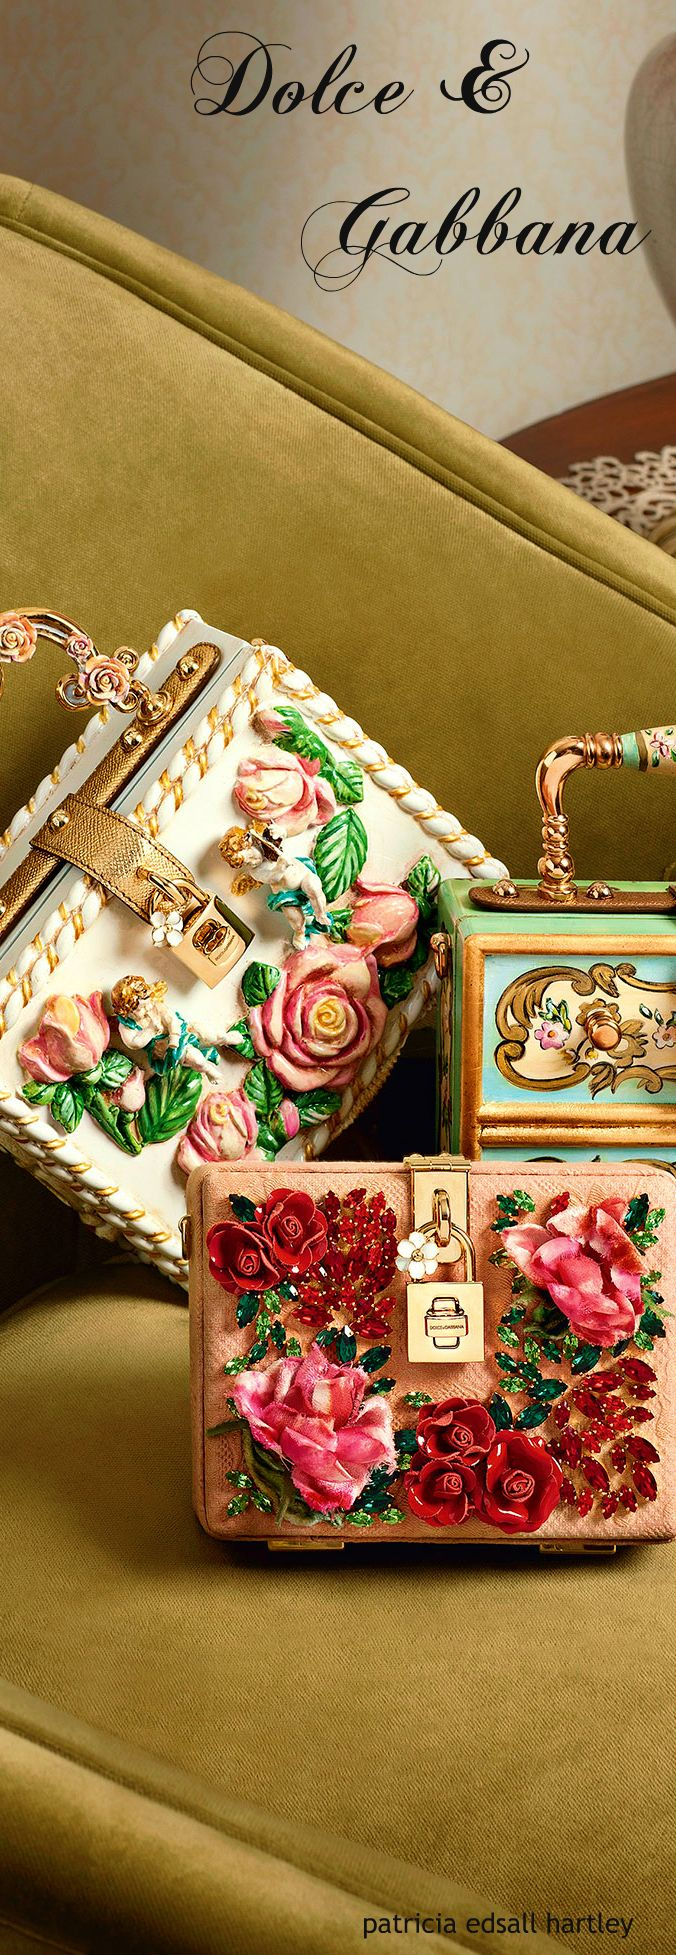 .~Dolce & Gabbana - Winter 2016~. @adeleburgess